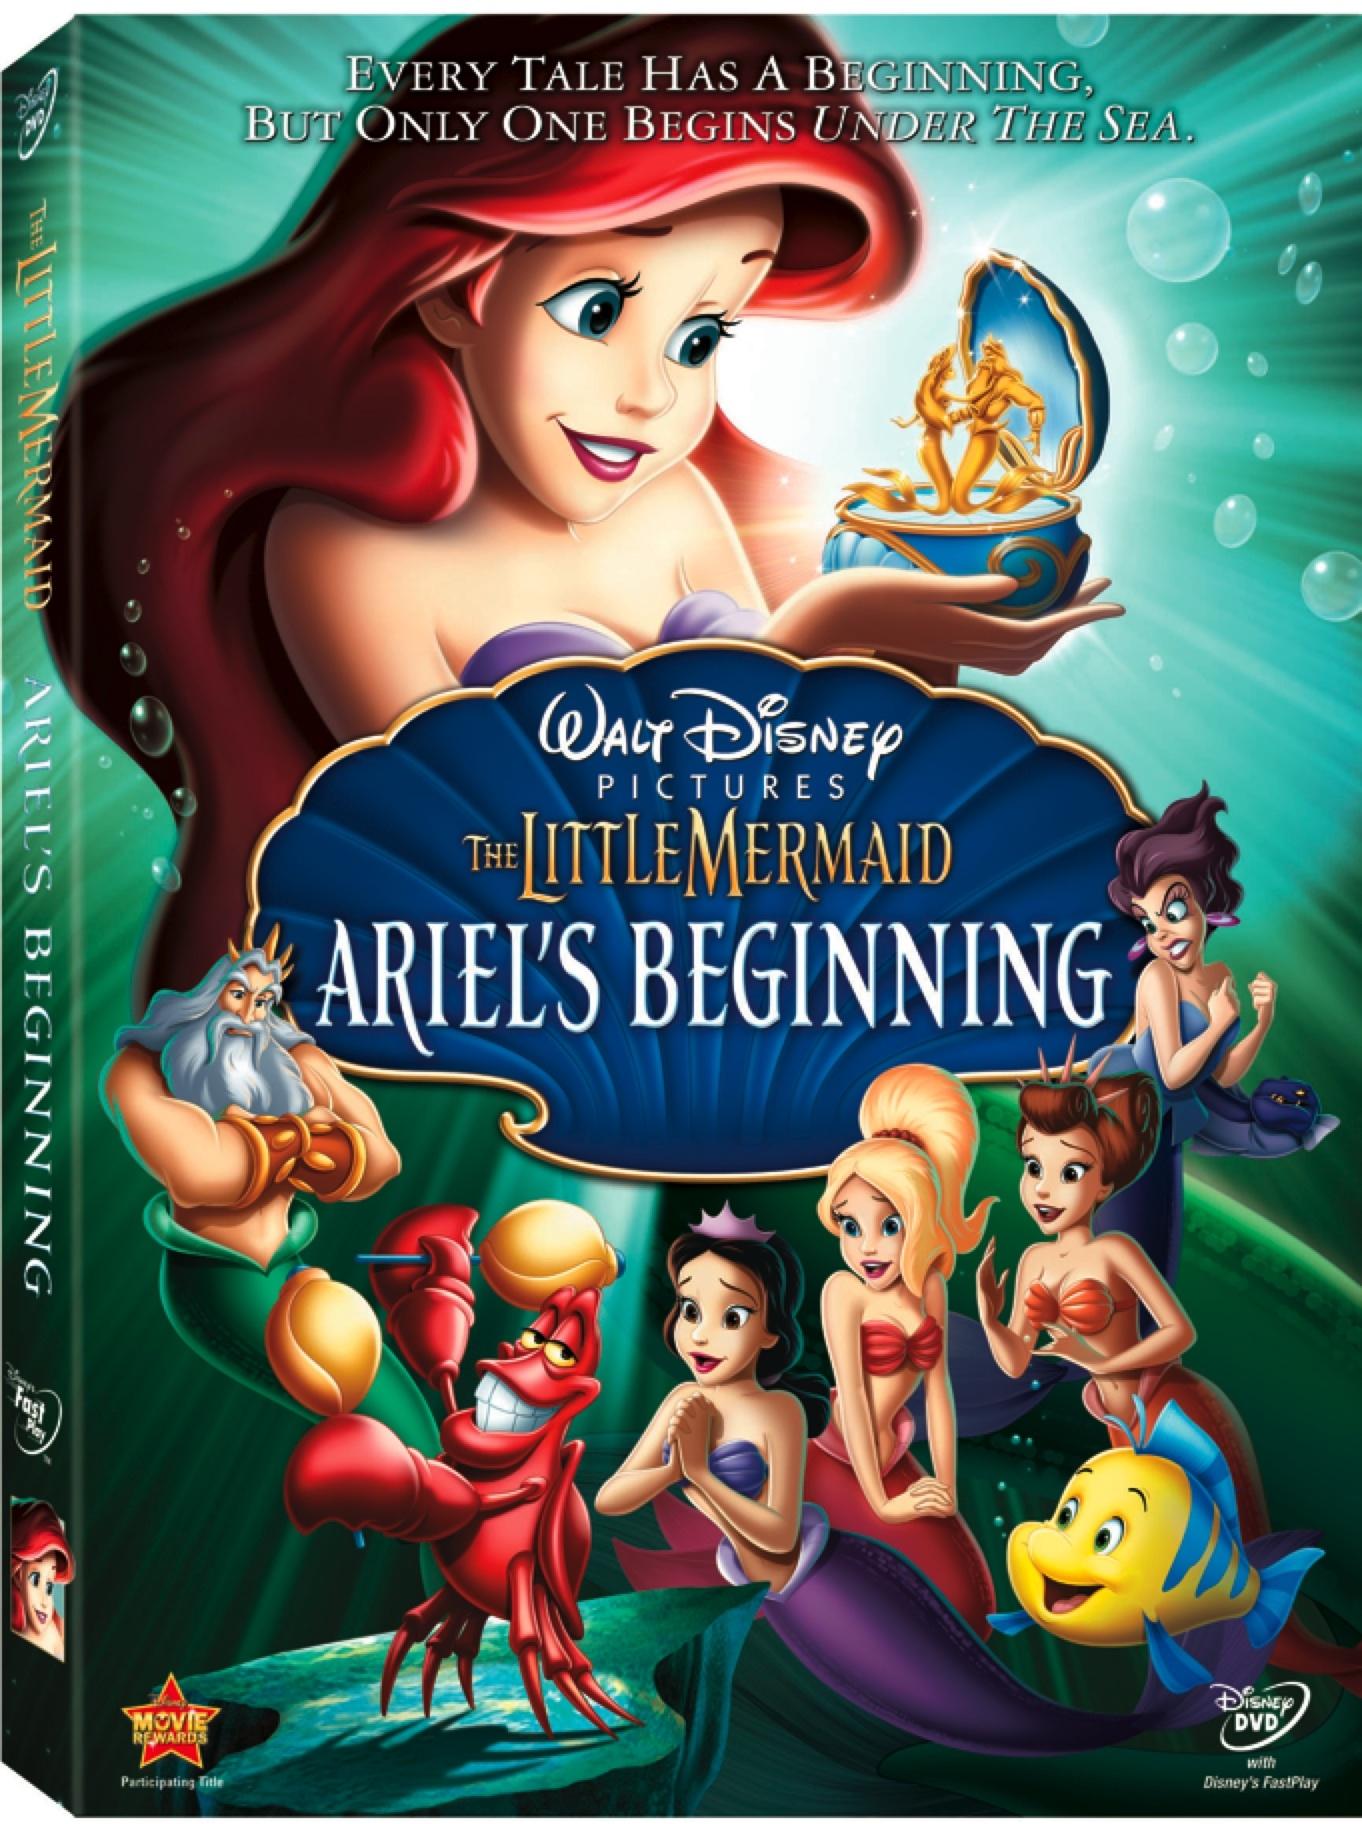 Win The Little Mermaid: Ariel's Beginning